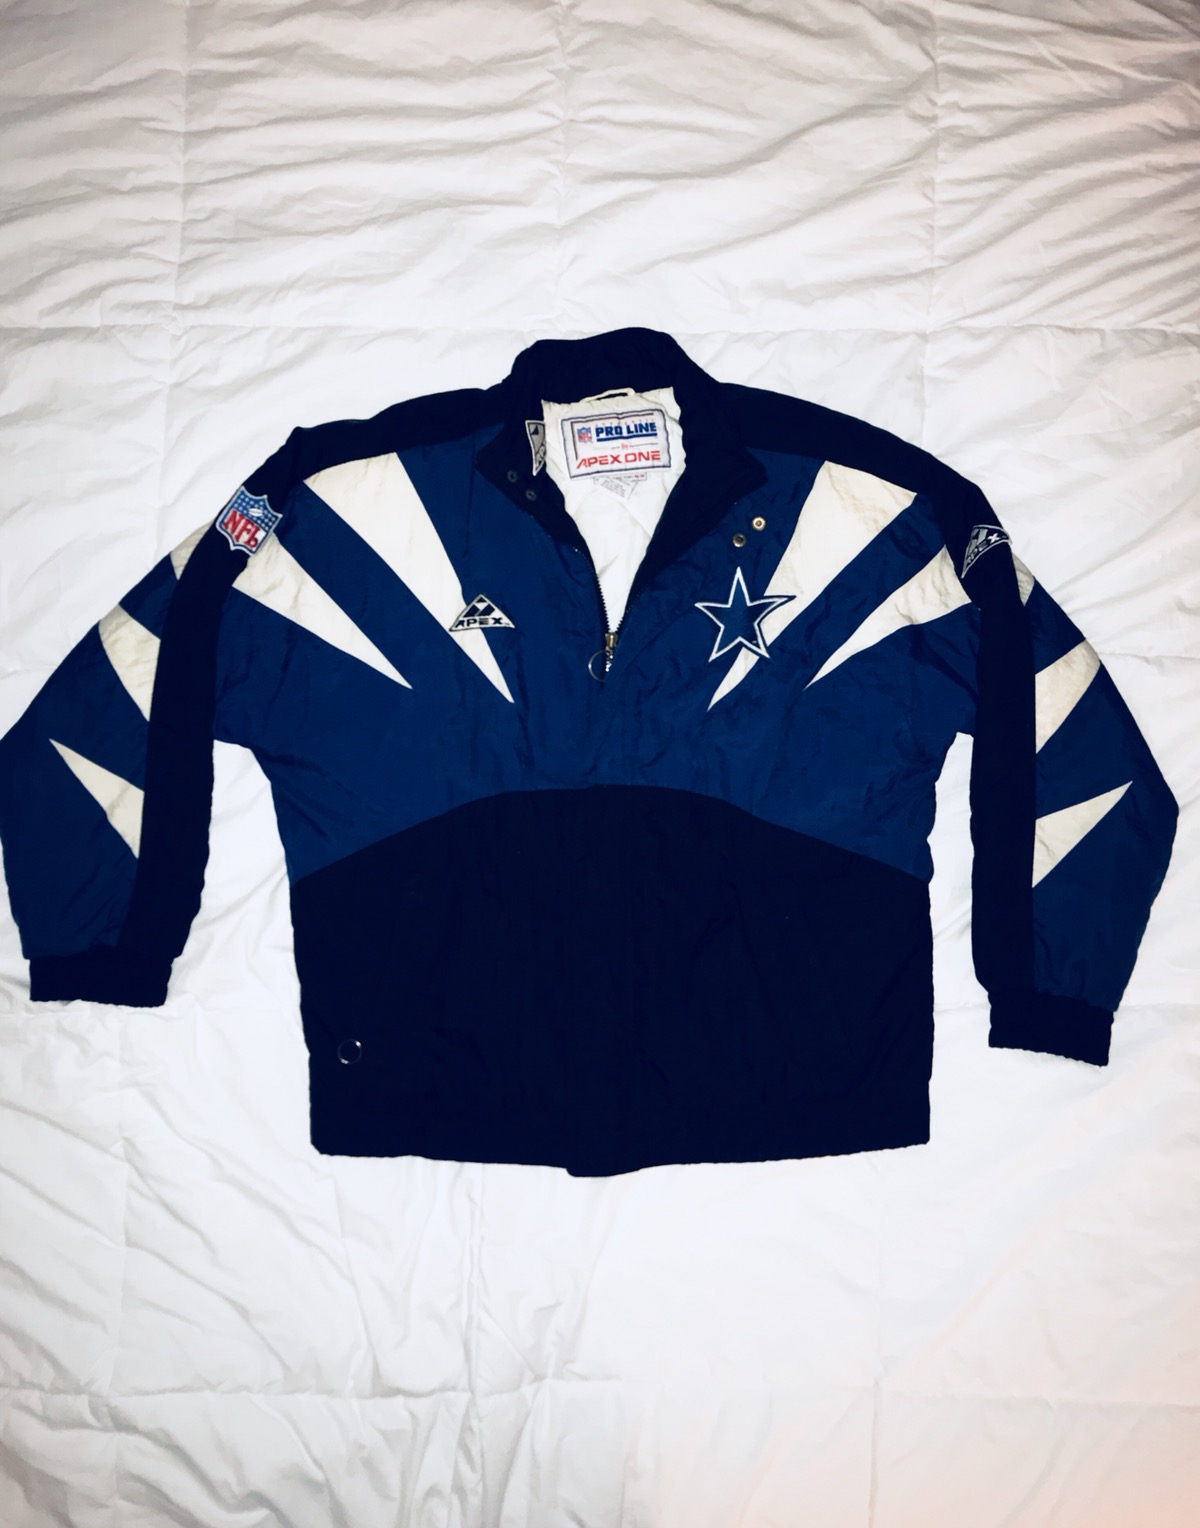 quality design abe2c b3bdb Vintage Dallas Cowboys Jacket